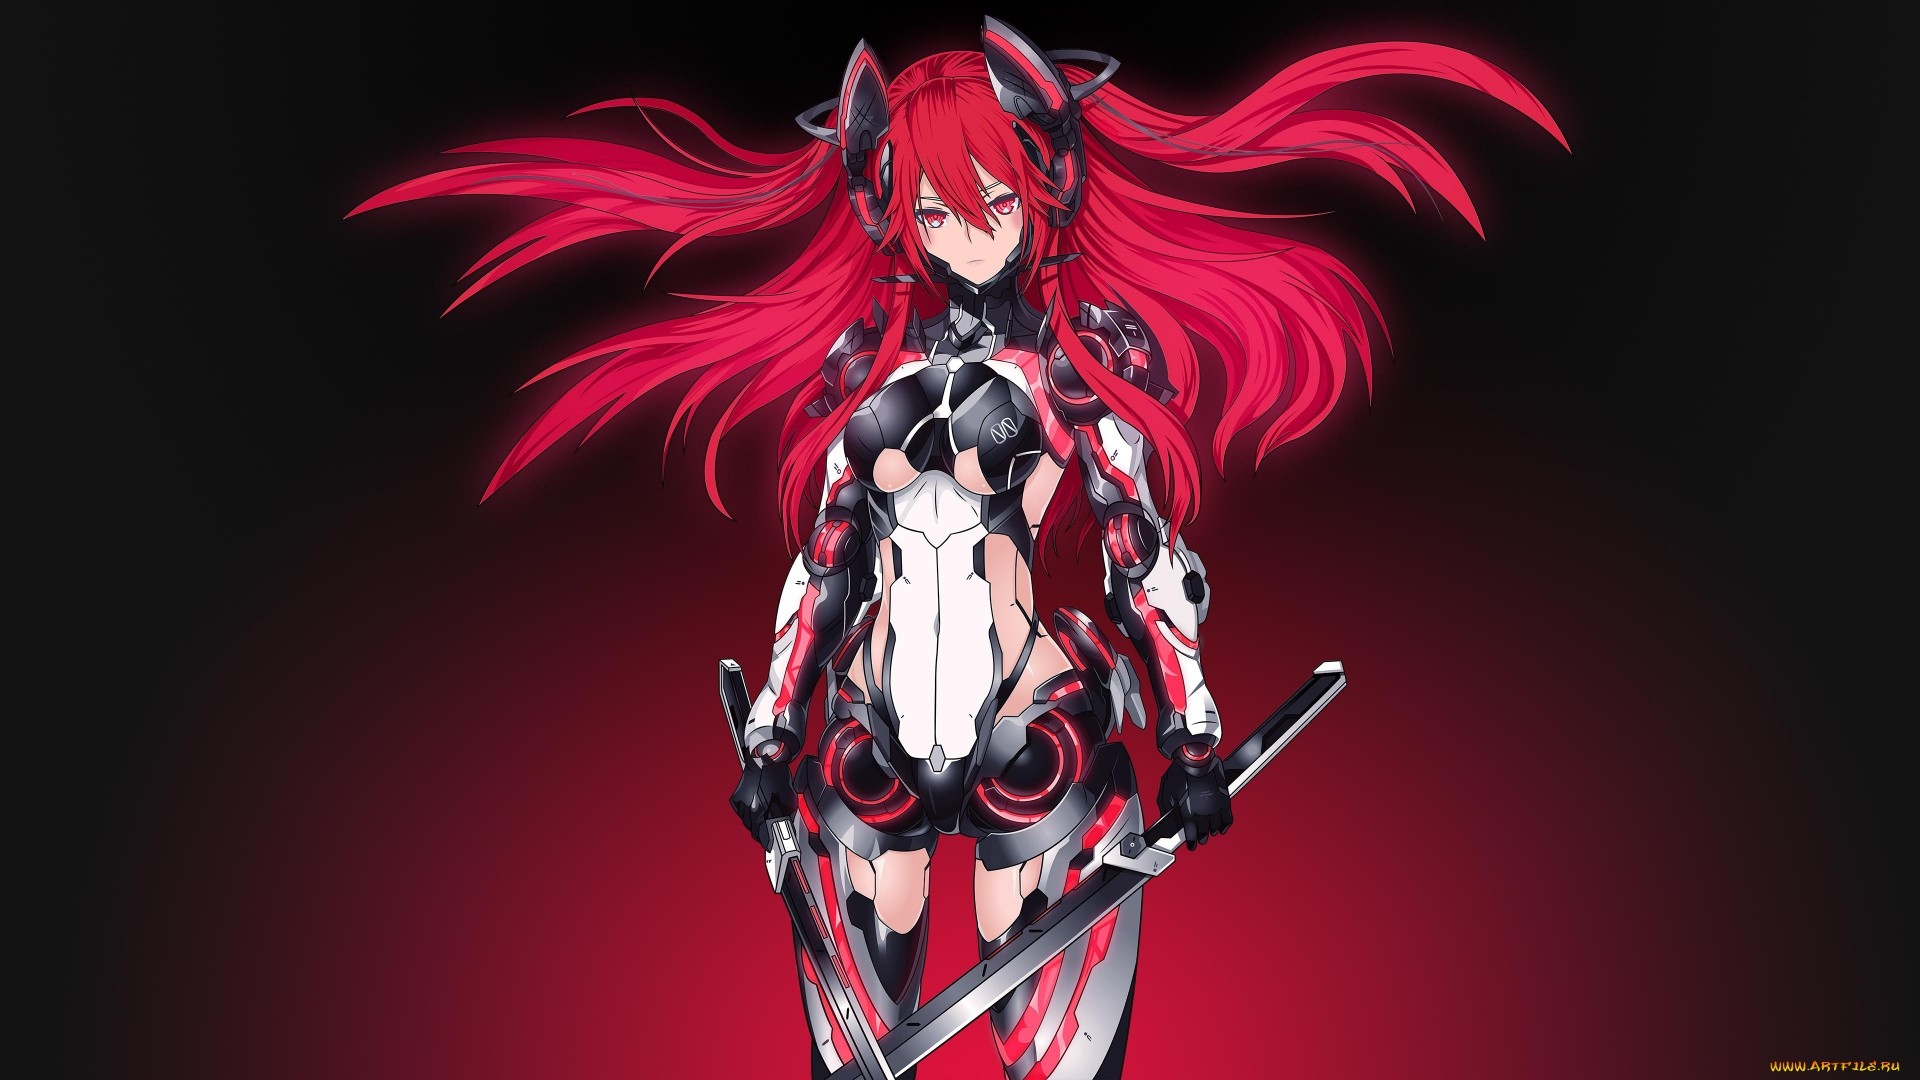 Red Hair Anime Girl Download Wallpaper